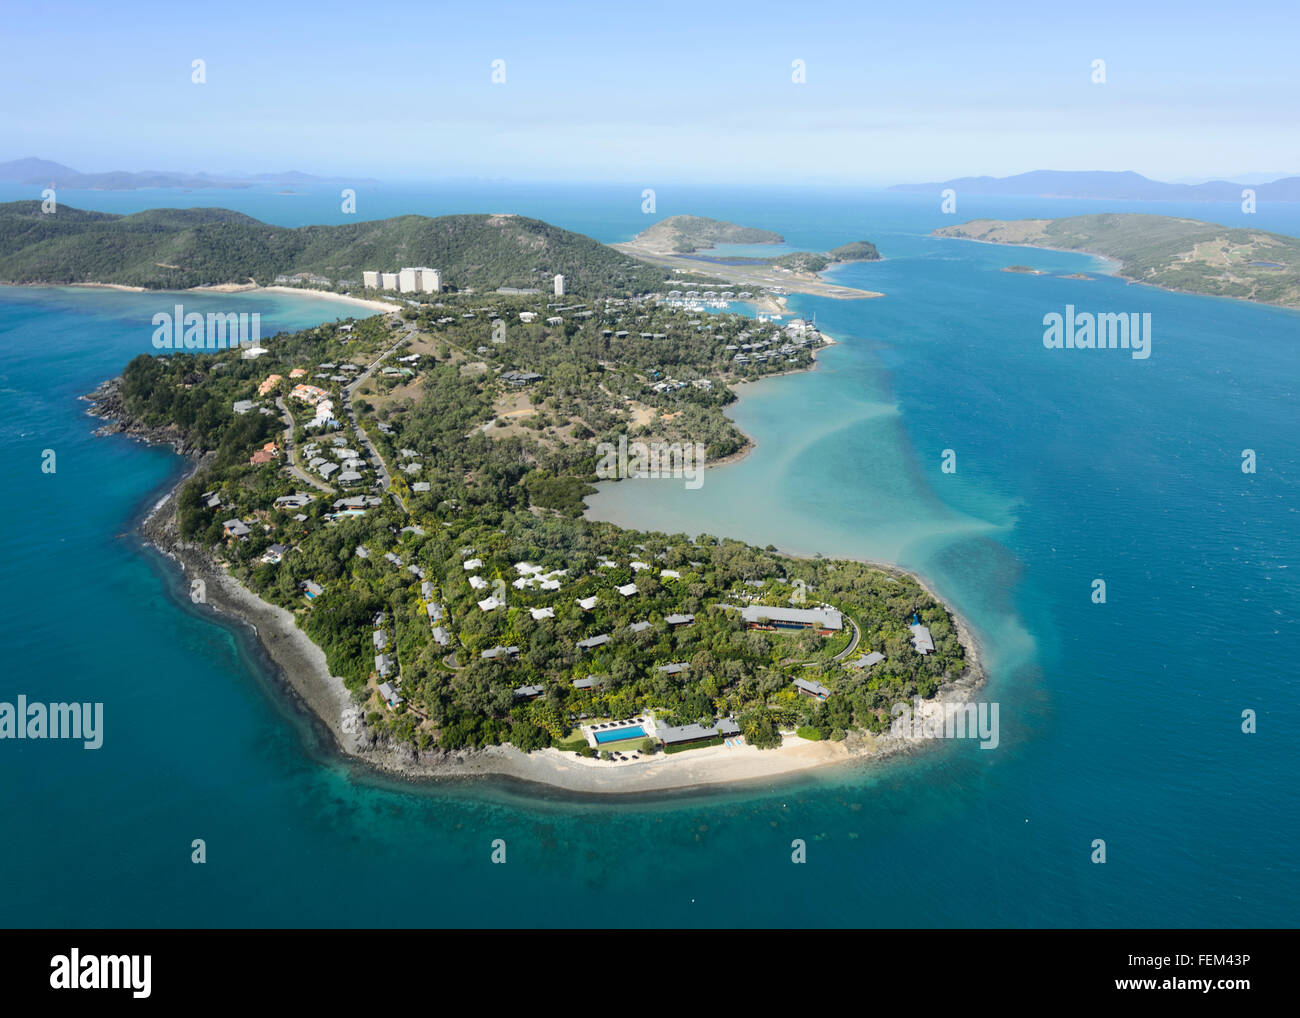 Aerial view of Hamilton Island, Queensland, Australia - Stock Image